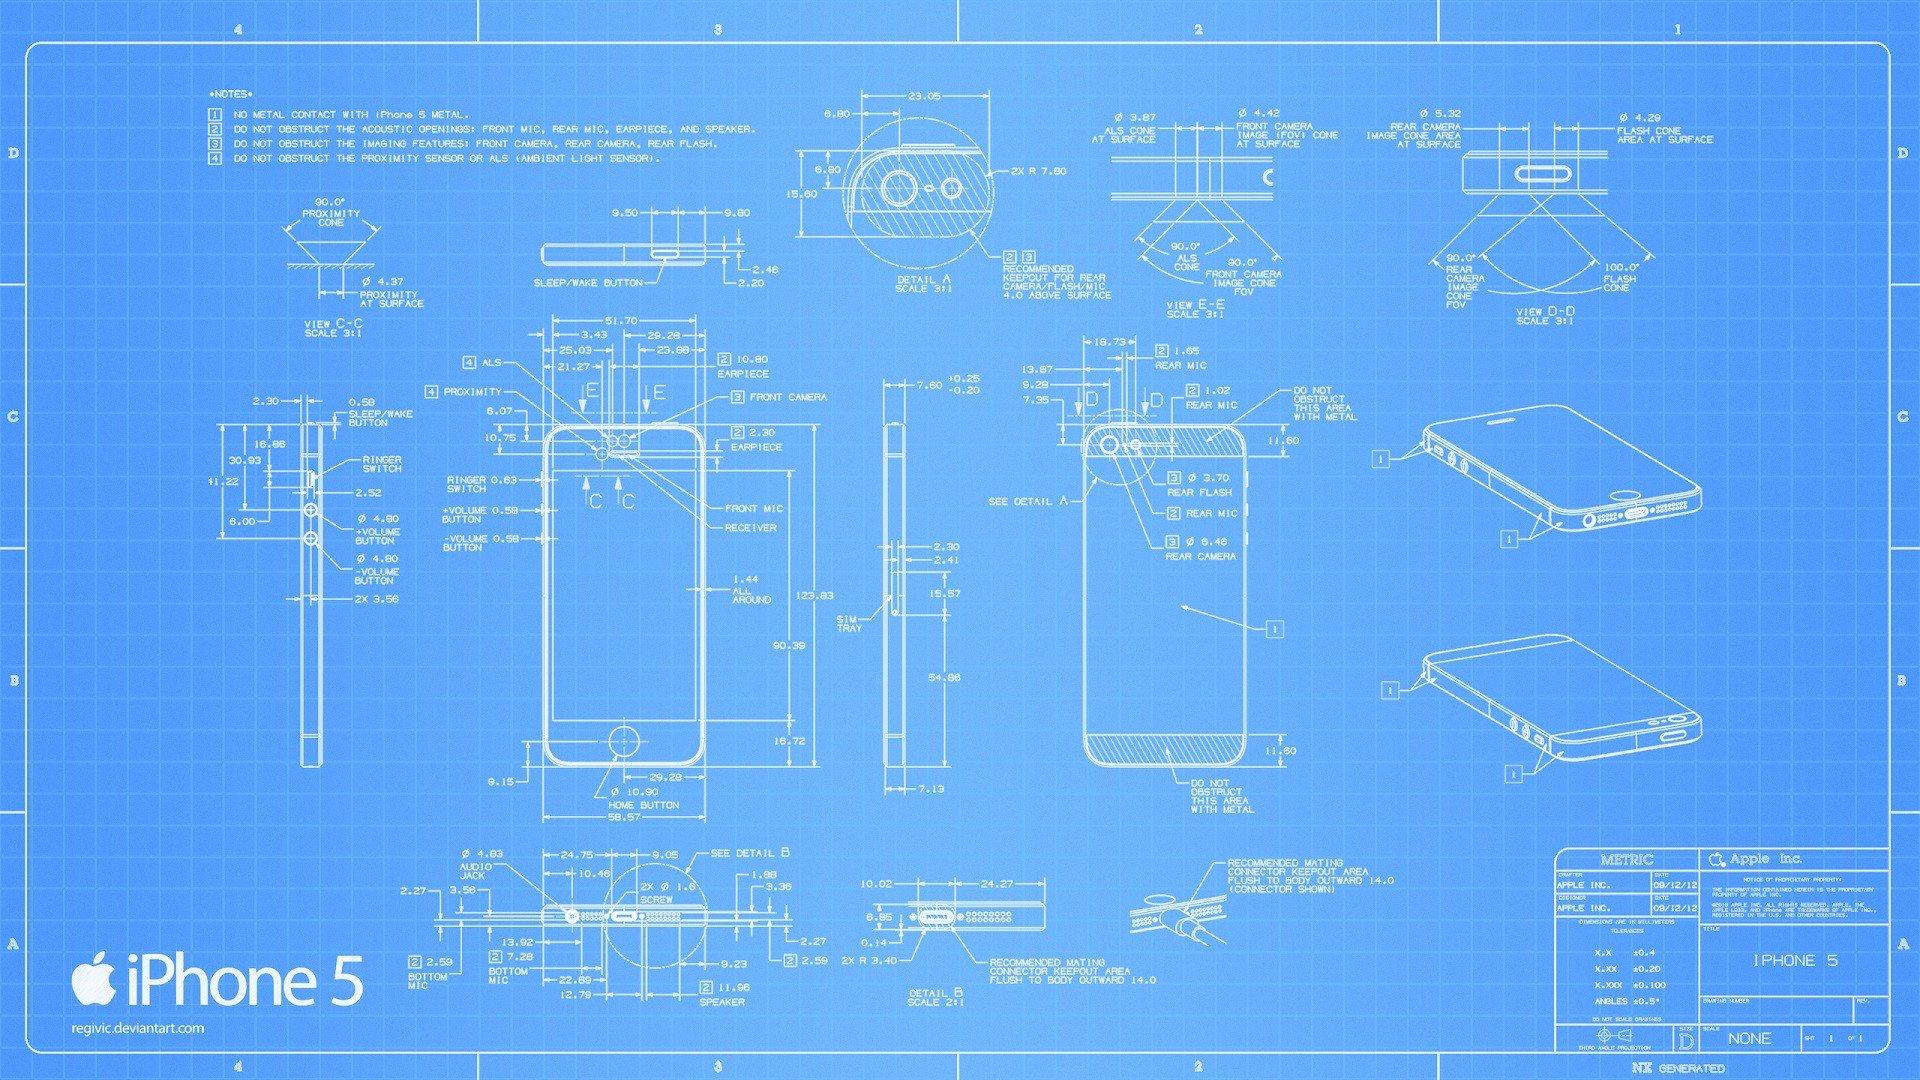 Deviantart blueprints iphone 5 wallpaper 1920x1080 345635 deviantart blueprints iphone 5 wallpaper 1920x1080 345635 wallpaperup malvernweather Gallery